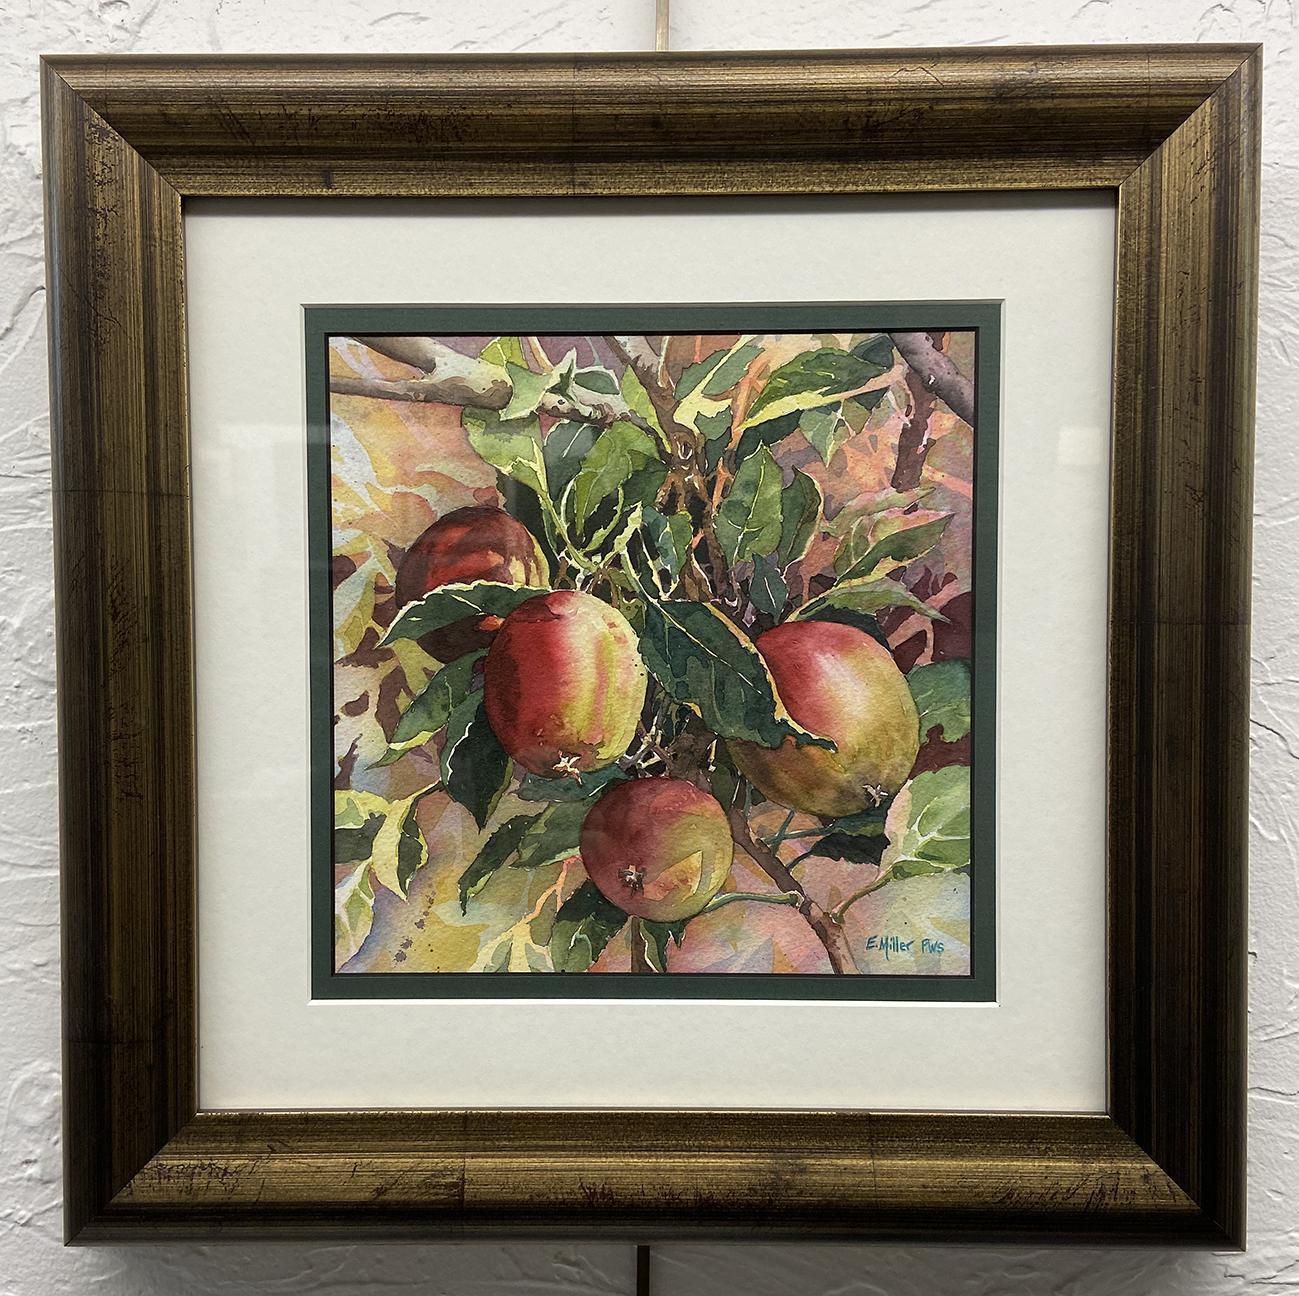 #4 Sweet Temptation, Eric Miller, Watercolor (14 x 14), $50.00 suggested minimum bid  (156 meals)